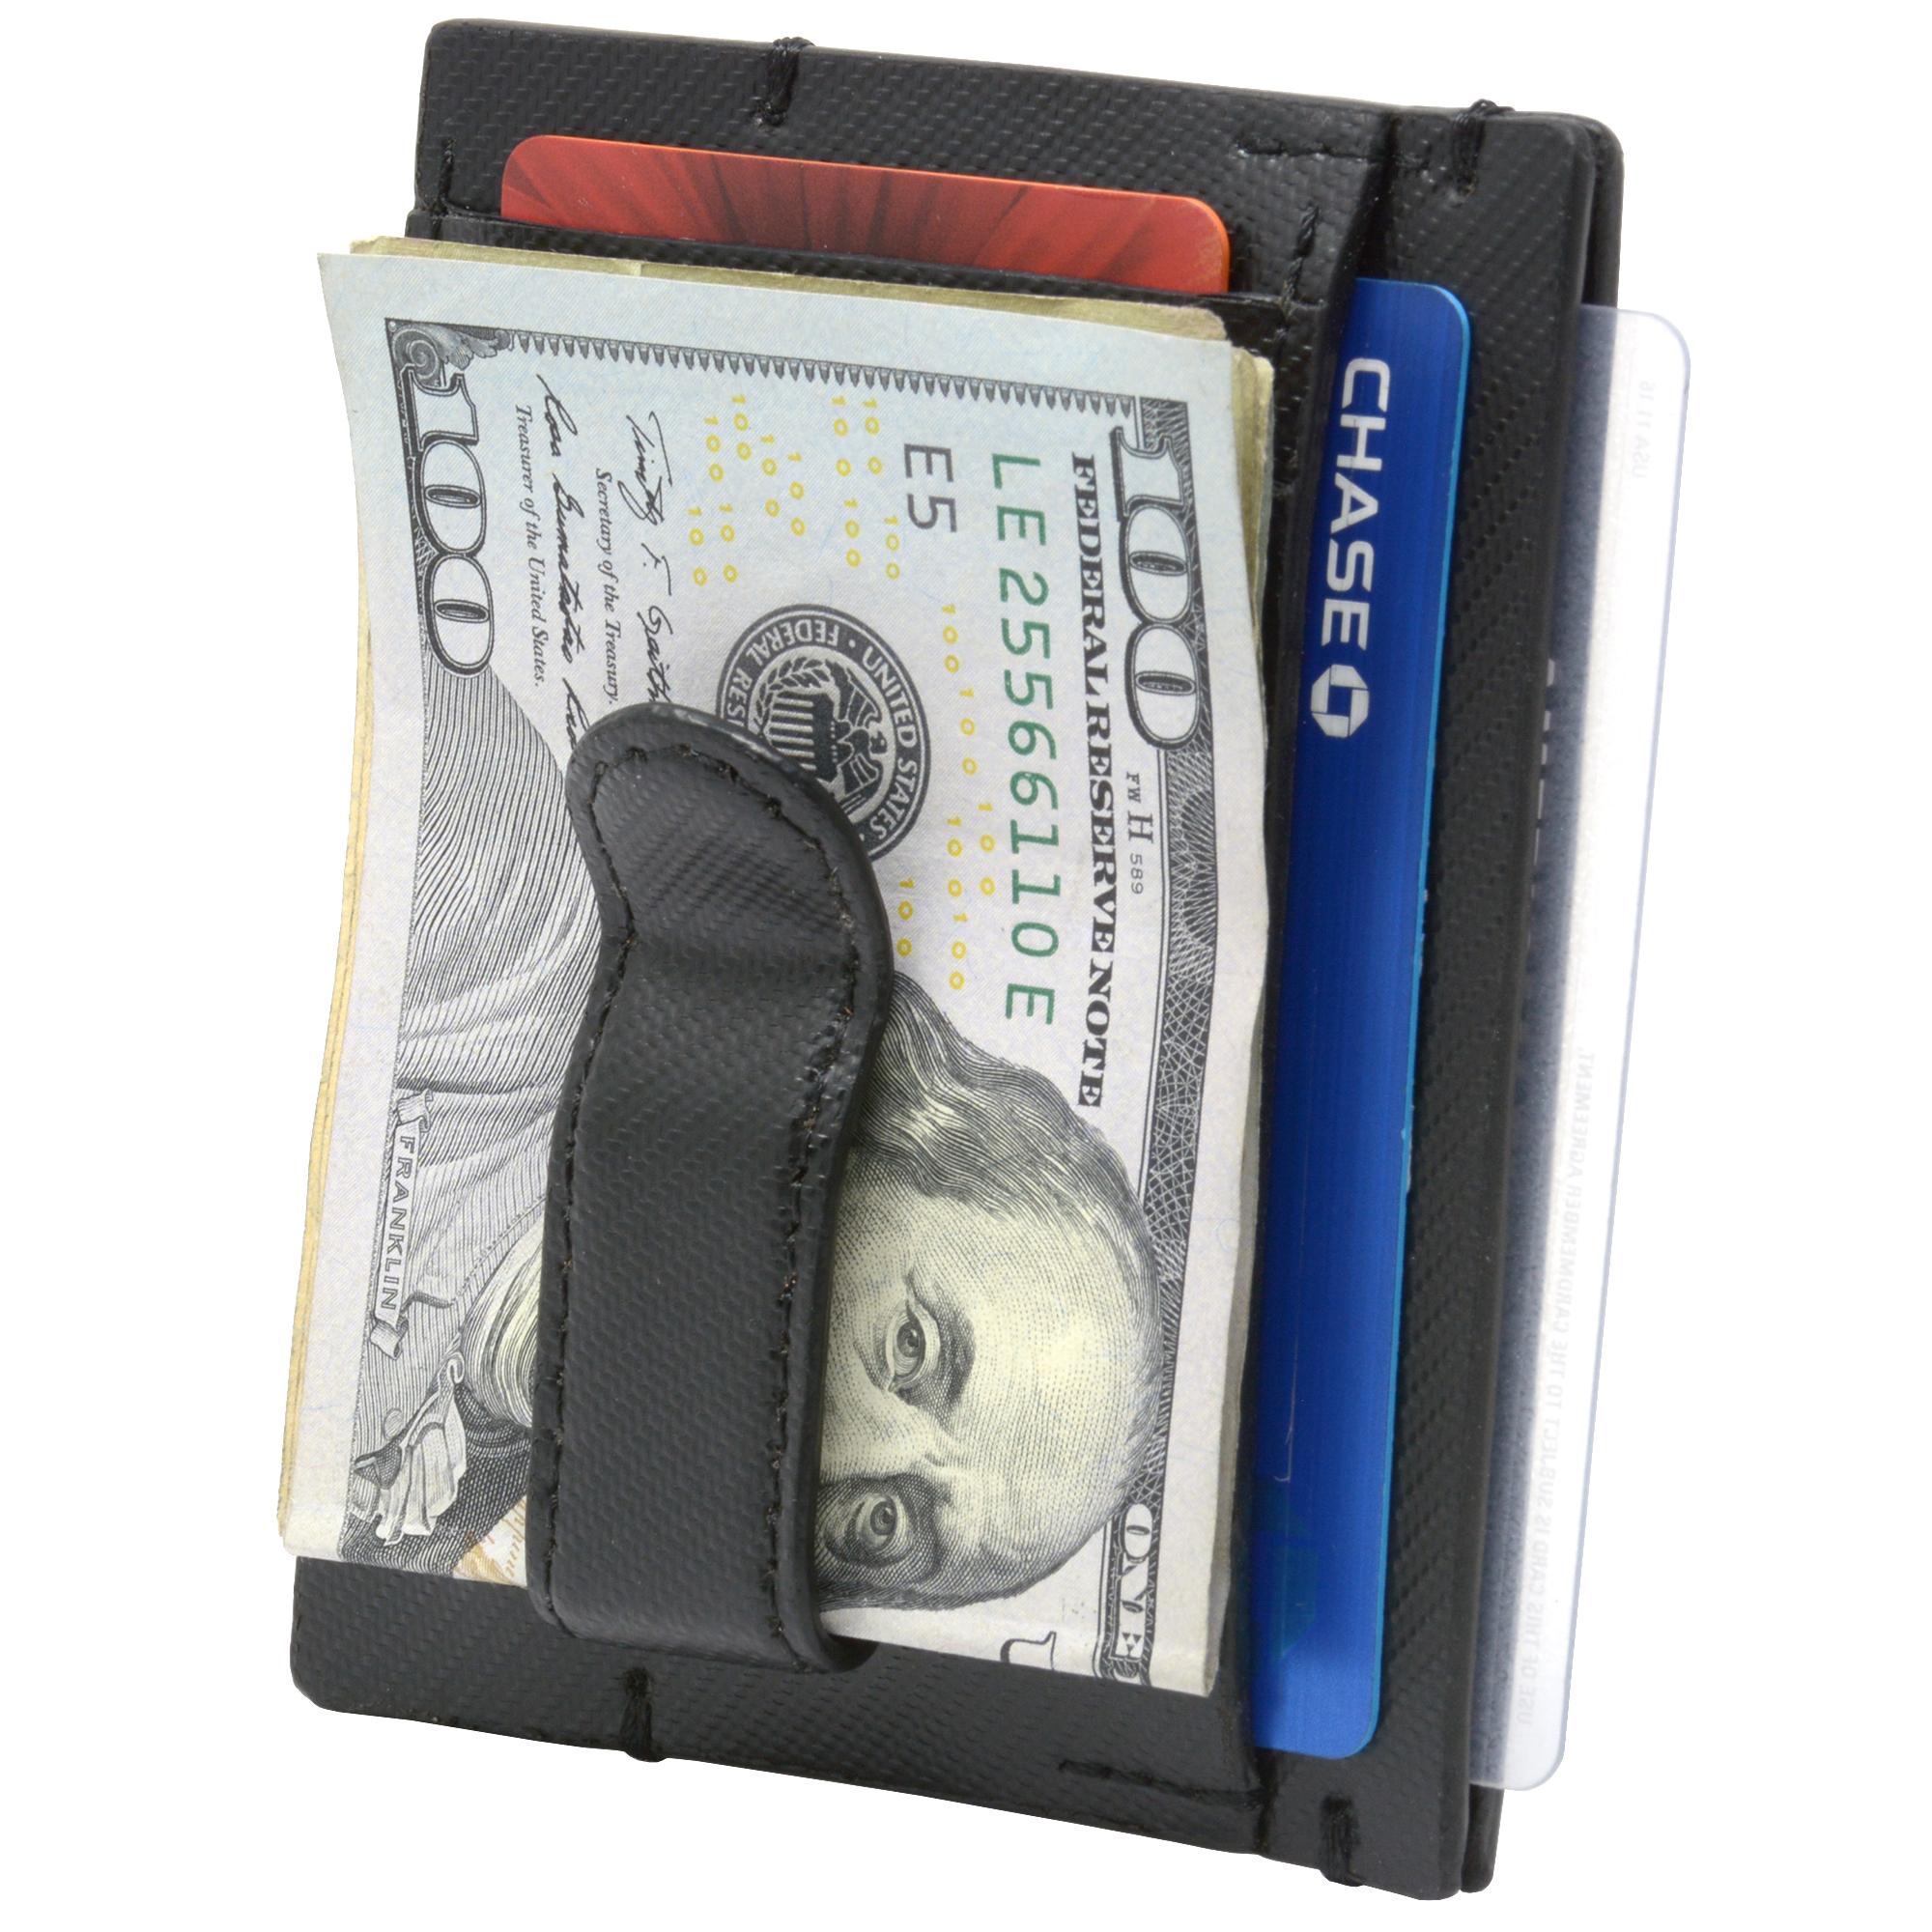 Alpine-Swiss-Double-Diamond-Men-s-RFID-Money-Clip-Minimalist-Front-Pocket-Wallet